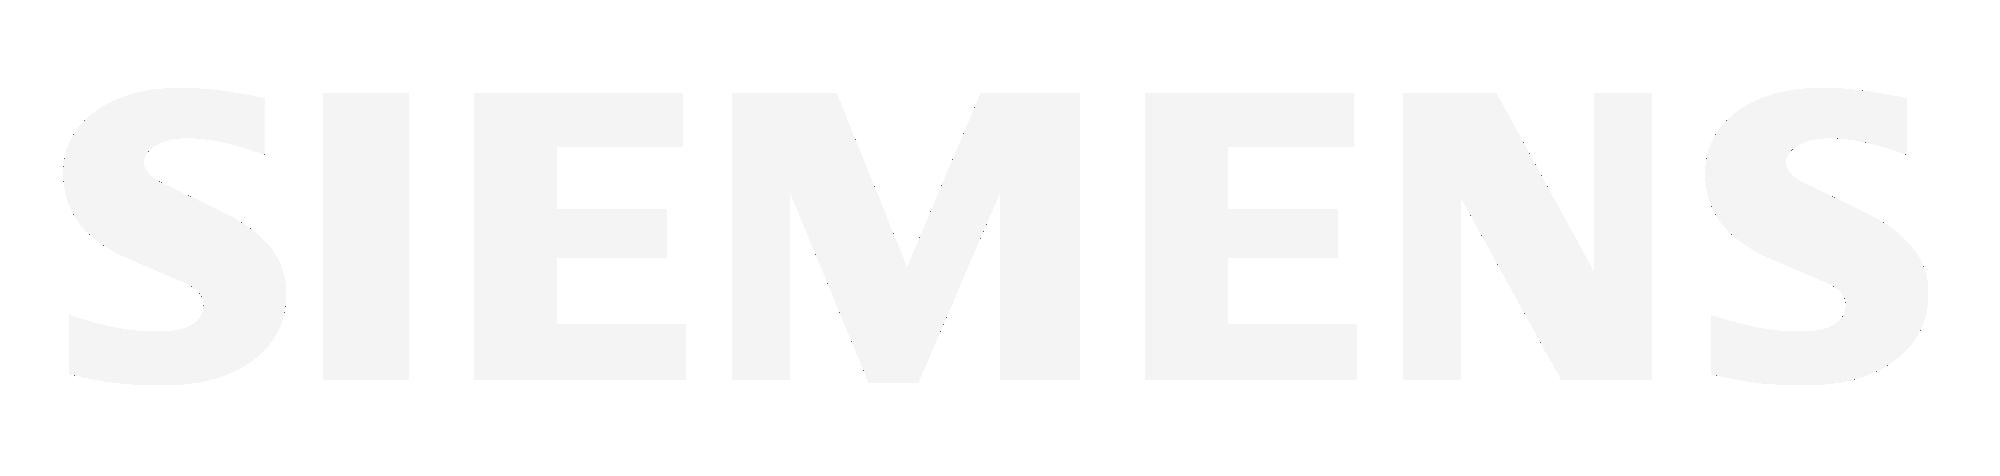 Siemens-bw.png